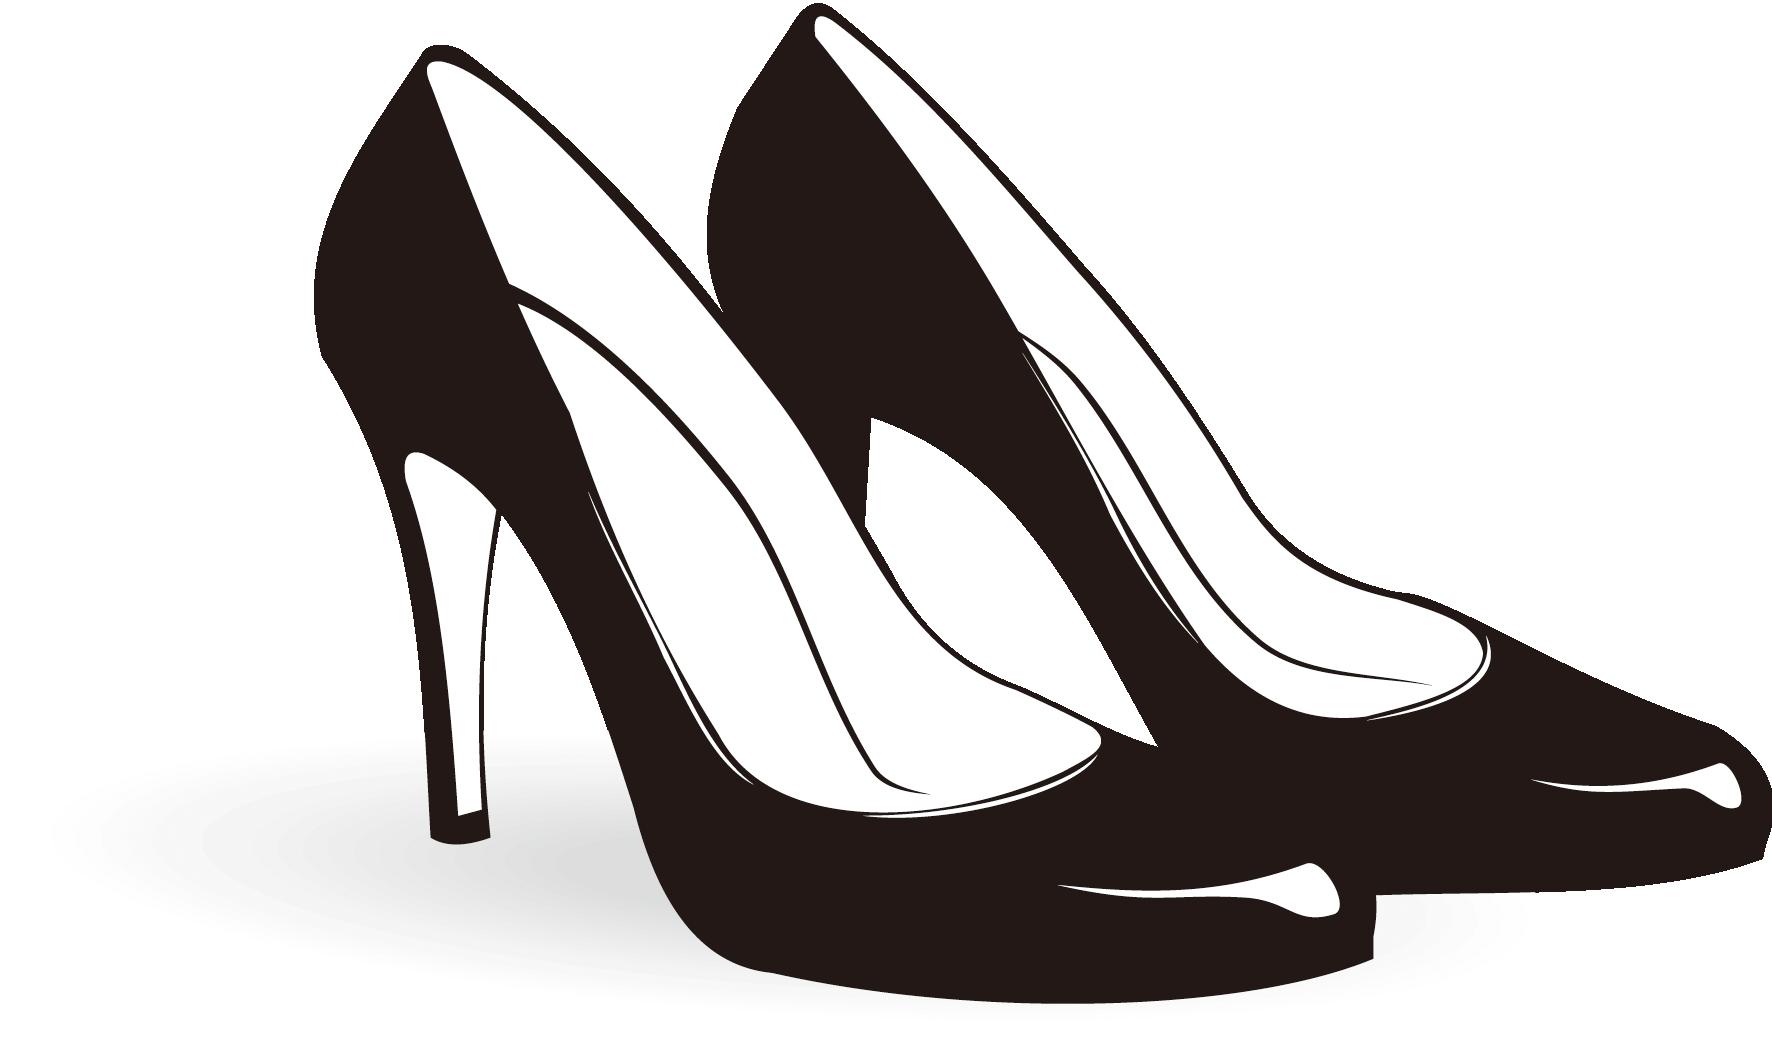 Heels clipart logo. Shoe high heeled footwear